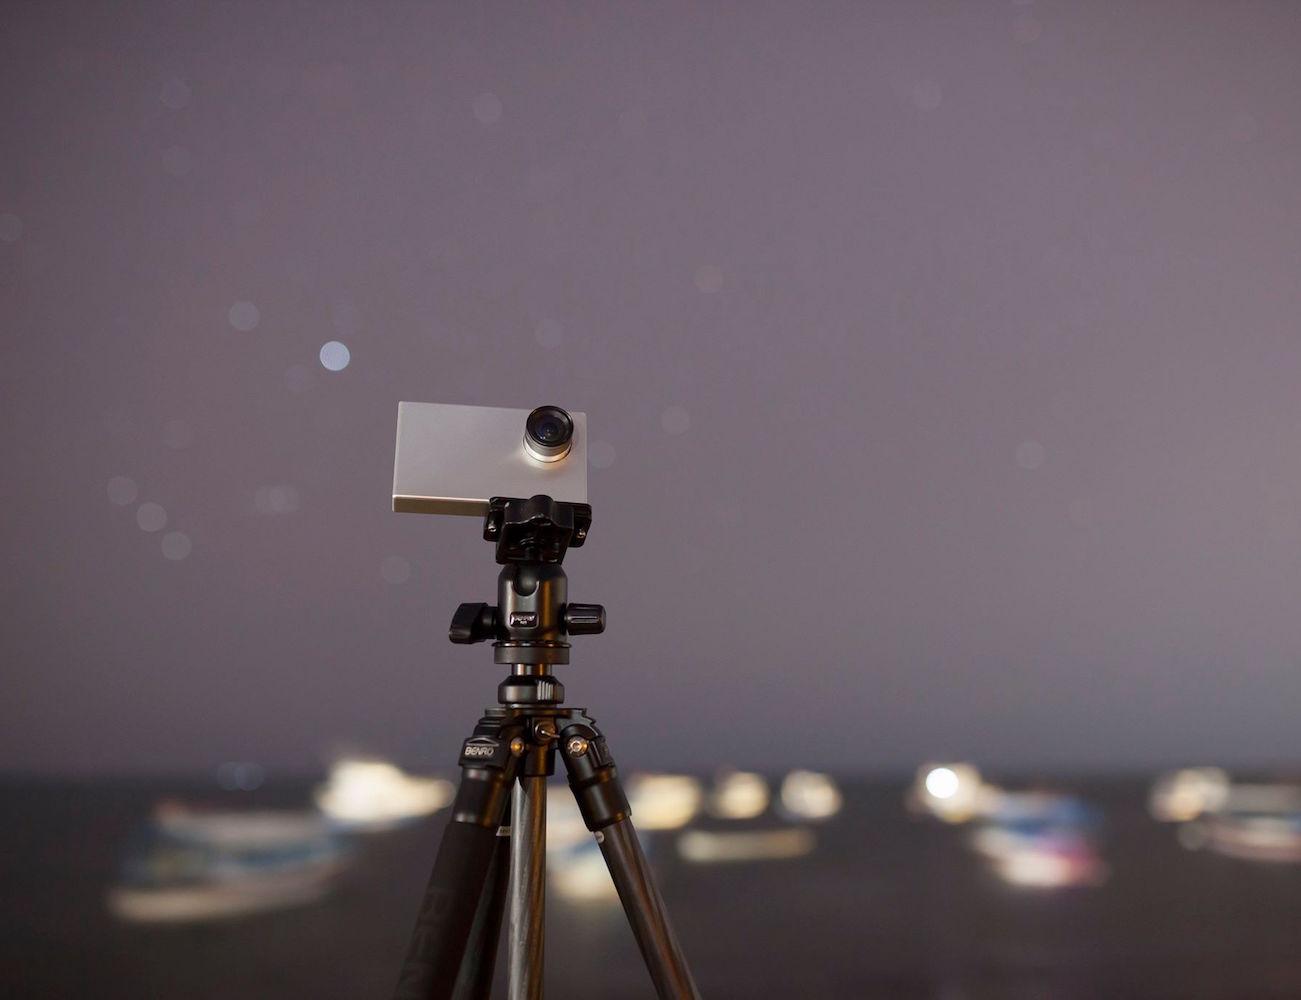 Tiny1 – The World's Smallest Astronomy Camera